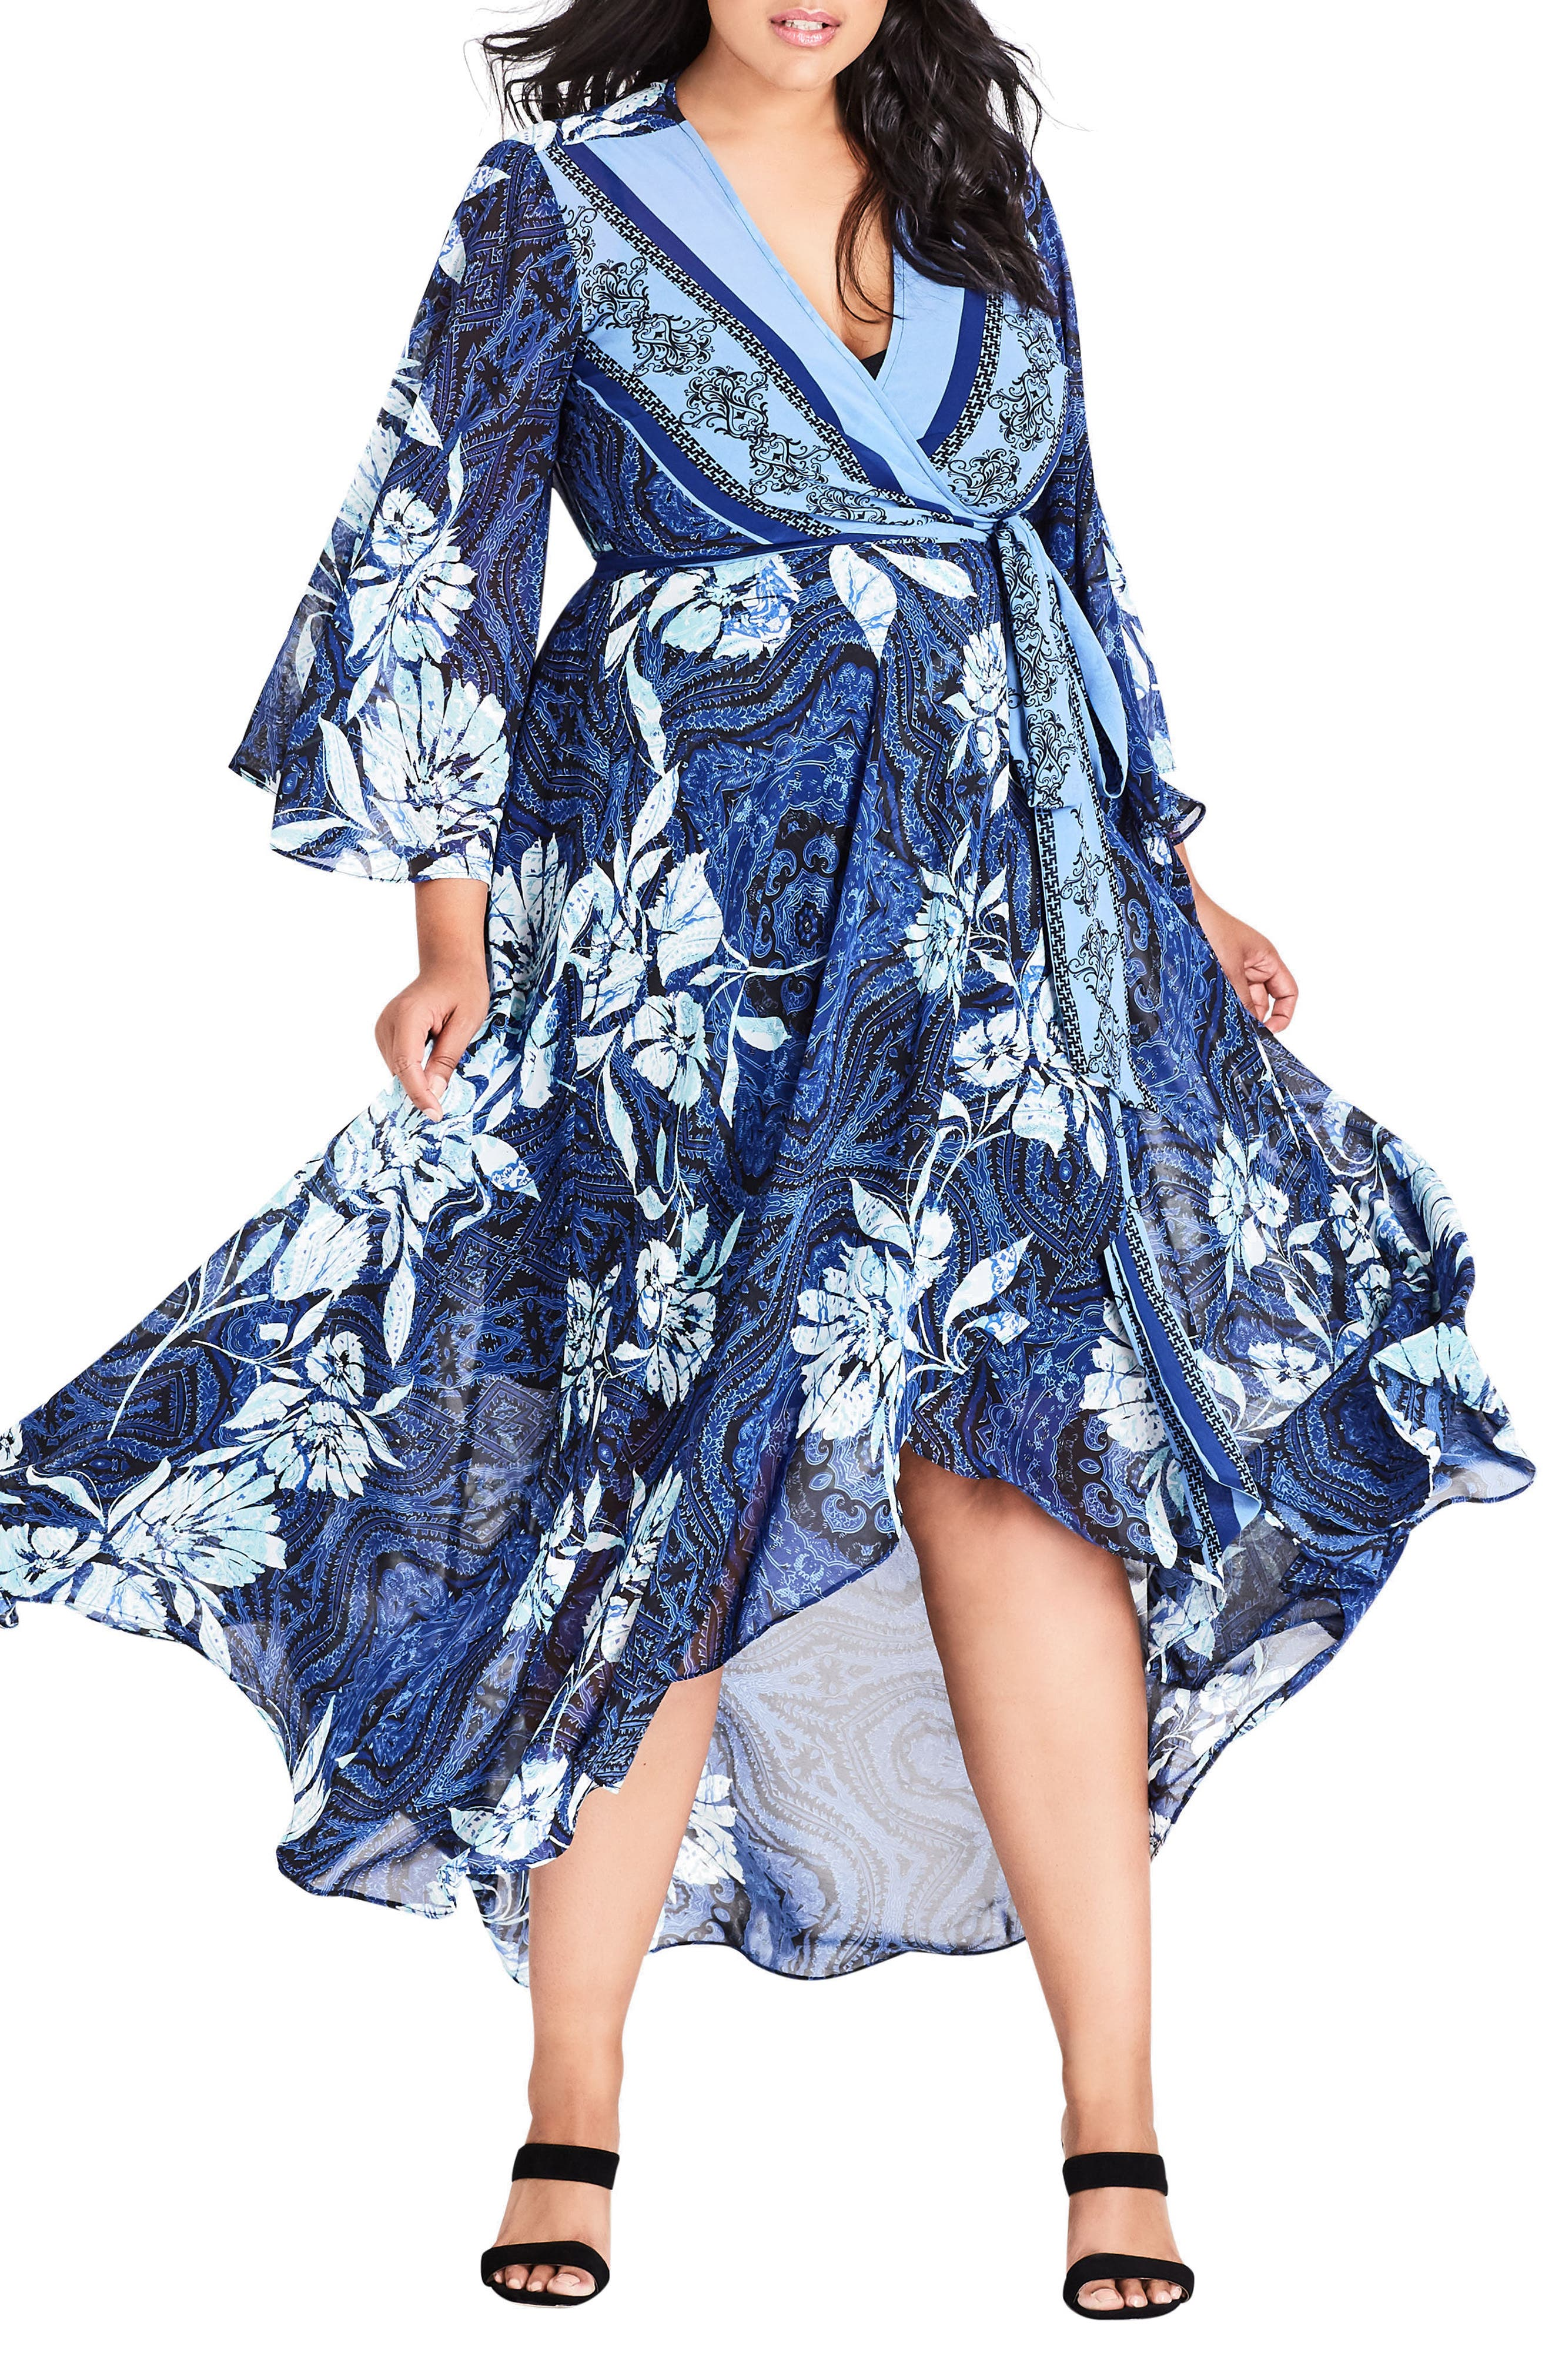 Blue Illusion High/Low Wrap Dress,                             Main thumbnail 1, color,                             BLUE ILLUSION